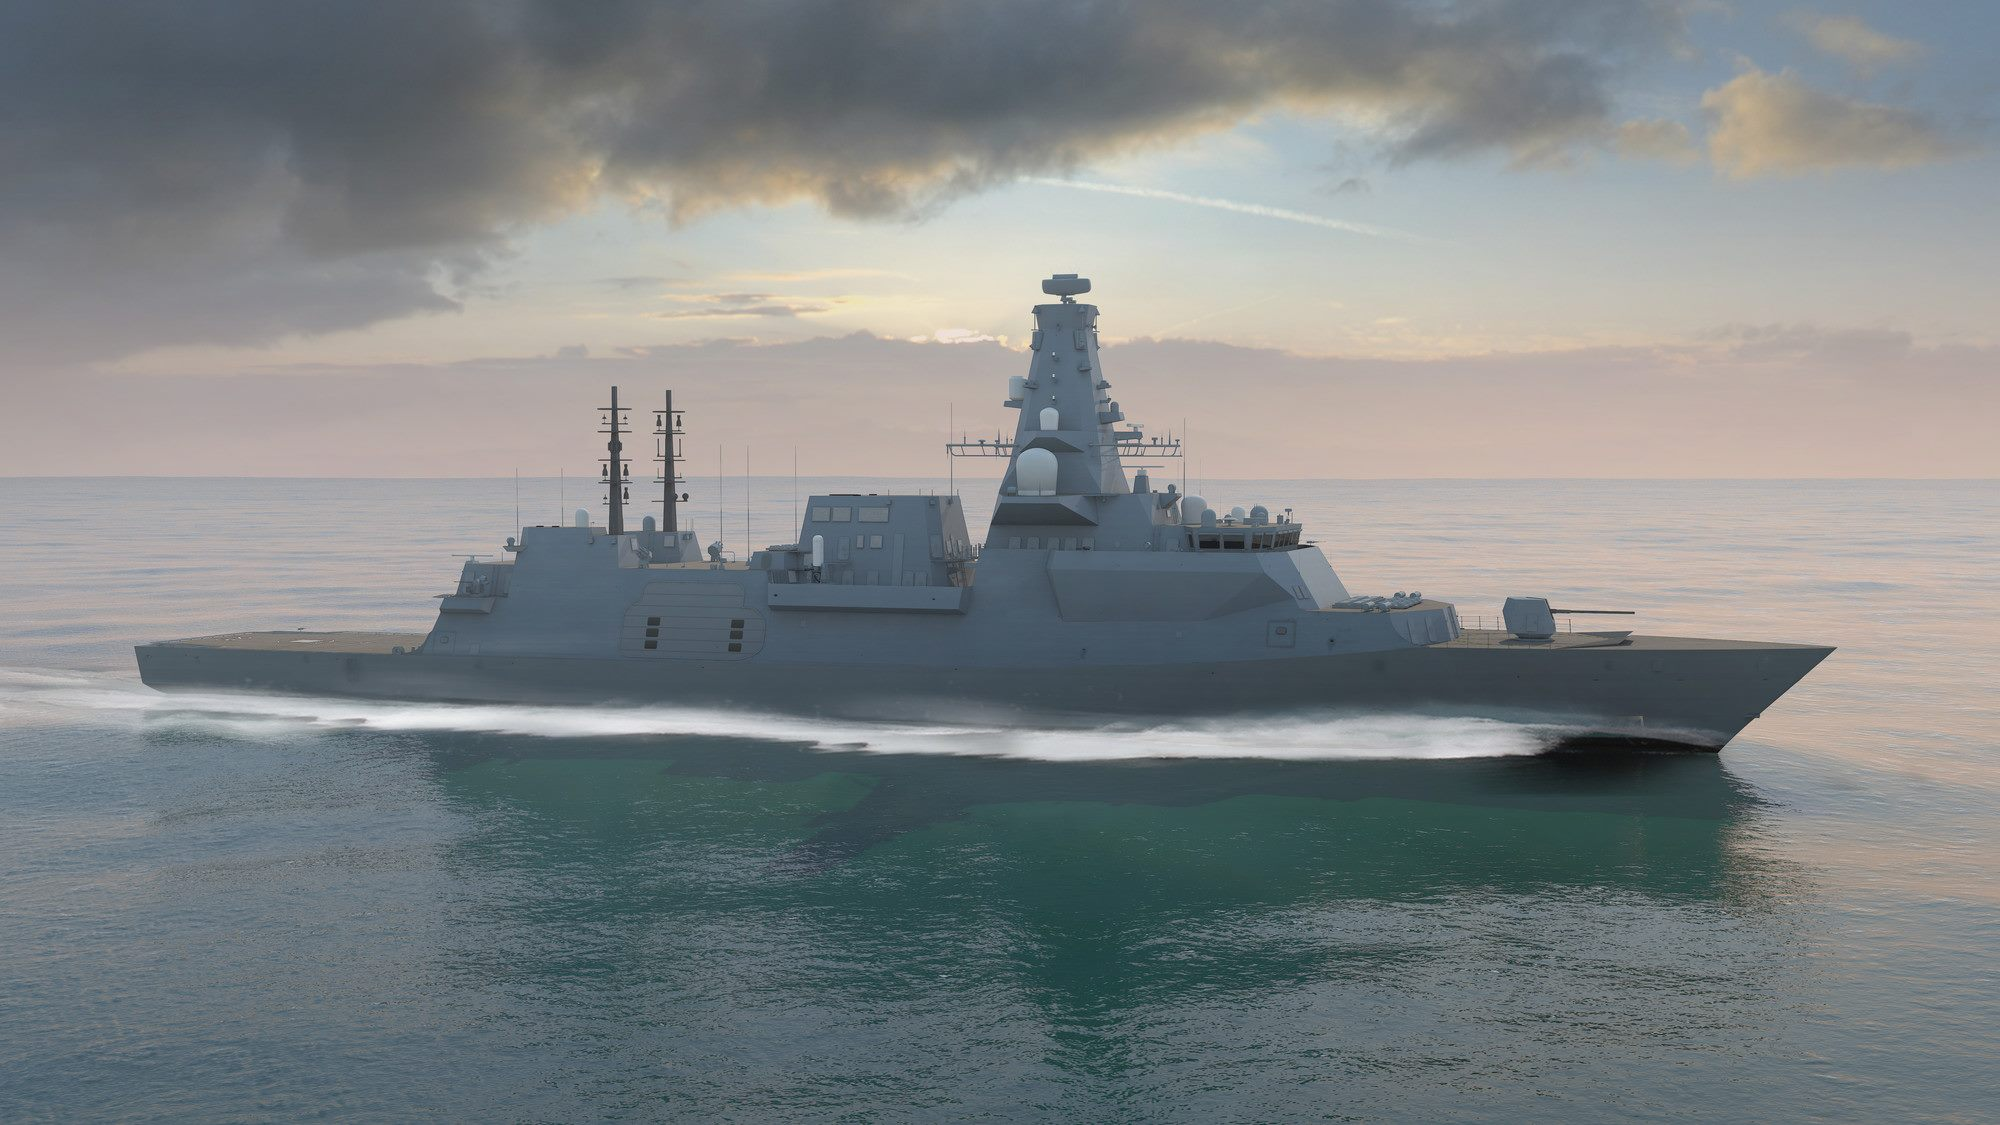 Концепт фрегата Тип 26 королевских ВМС Великобритании.